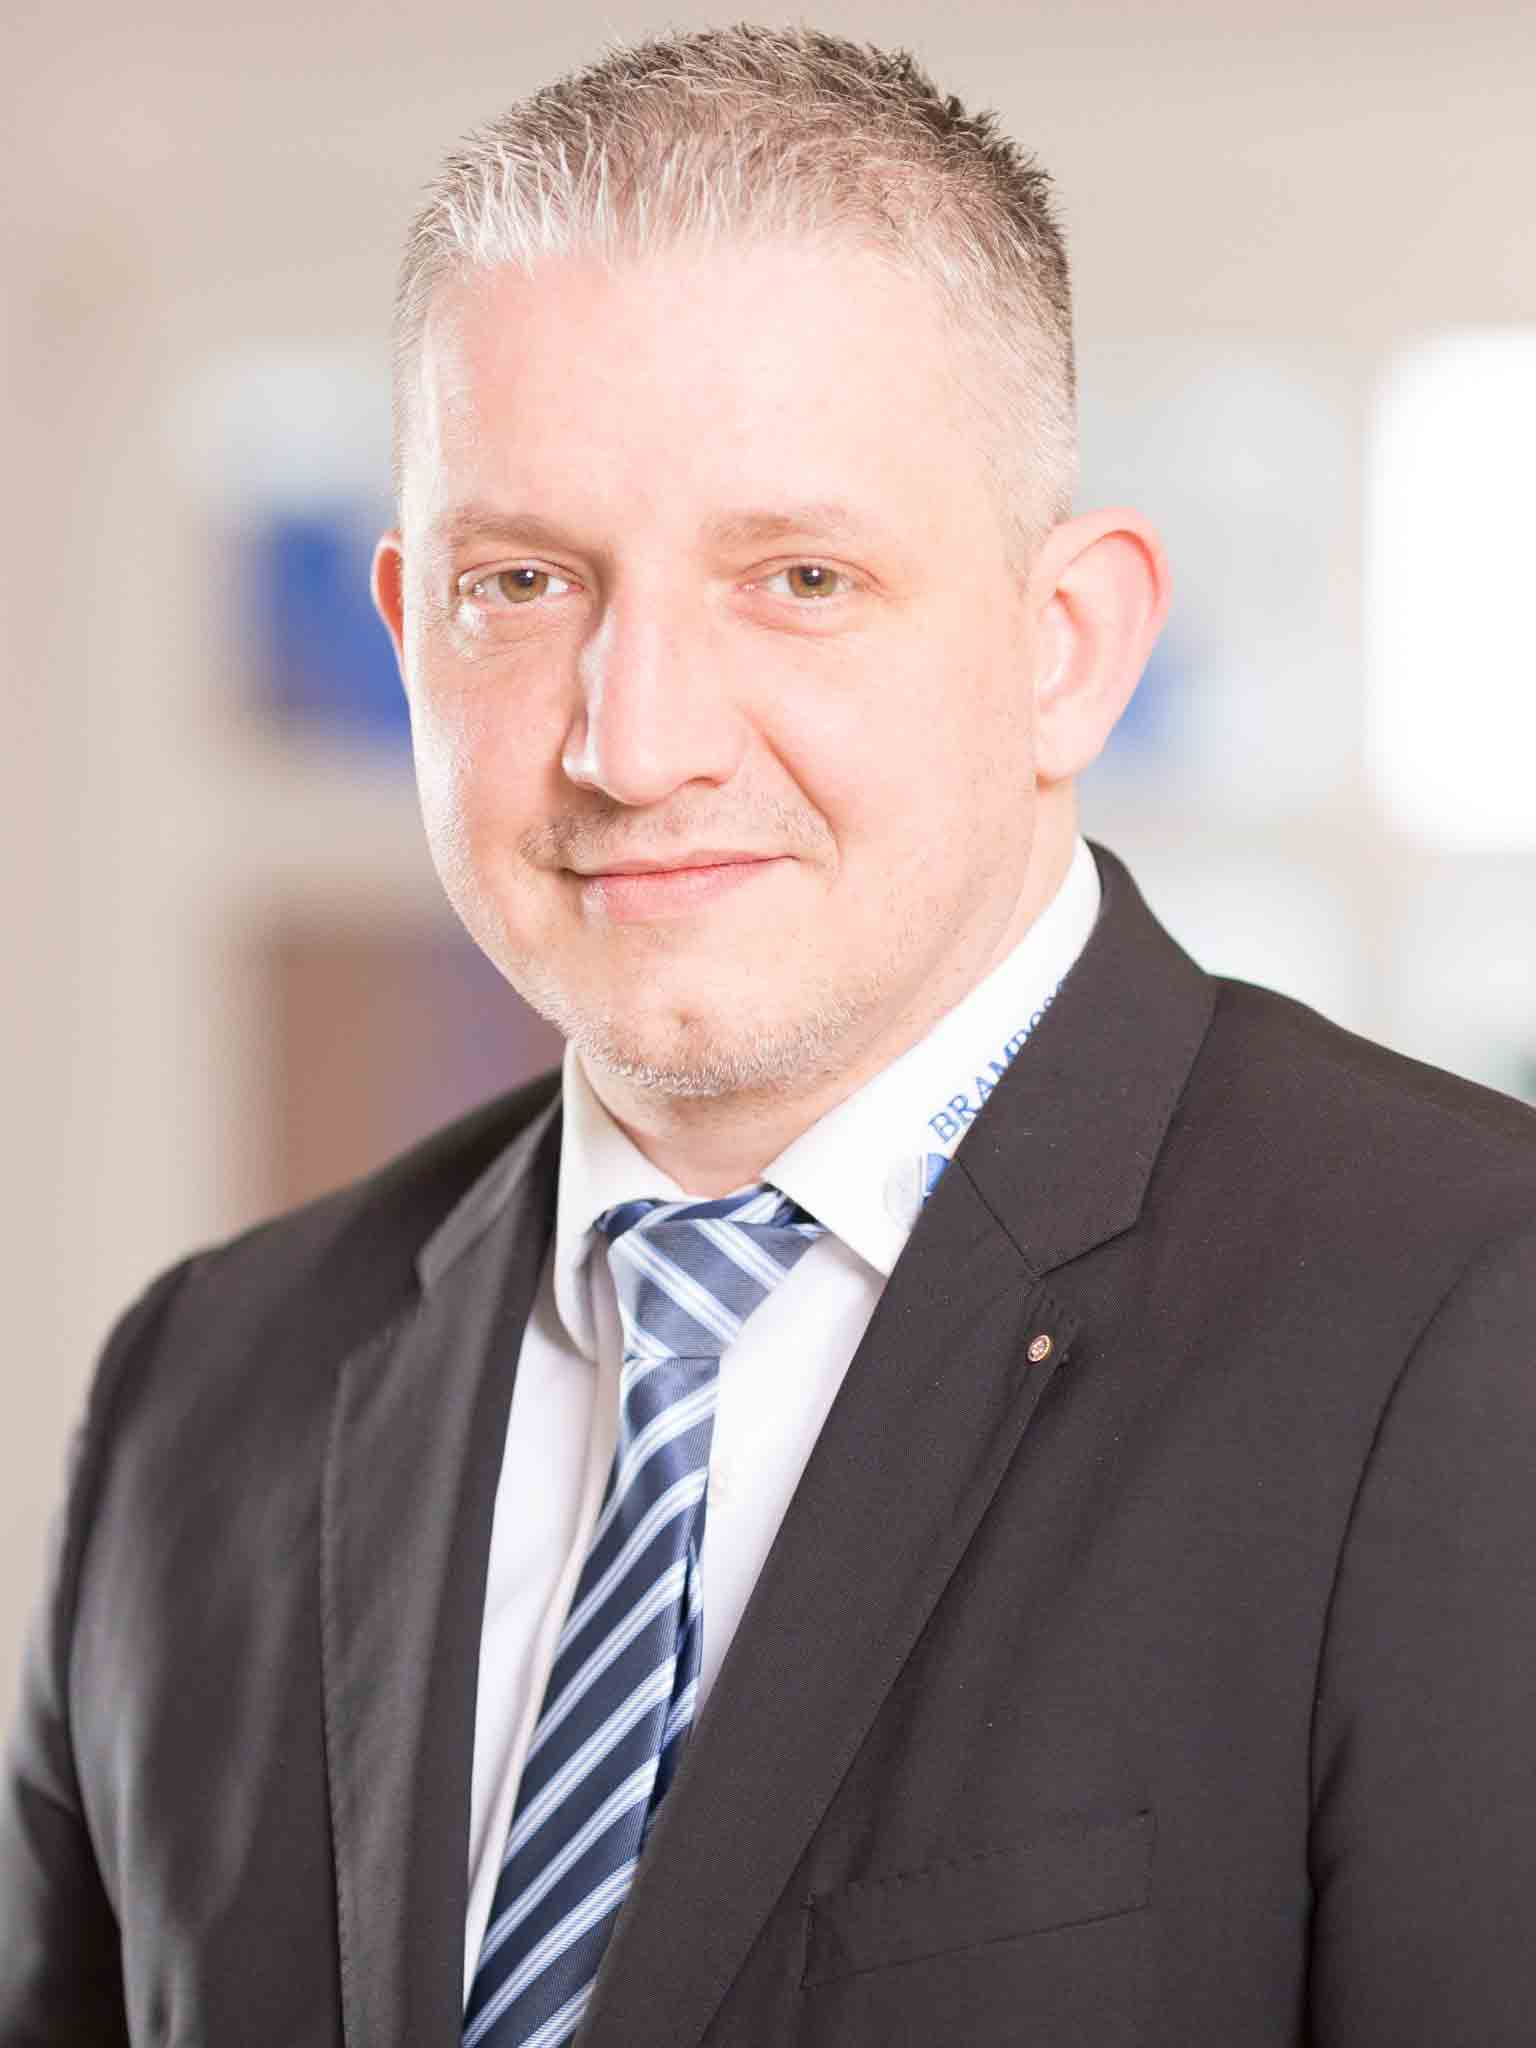 Matthias Brambosch